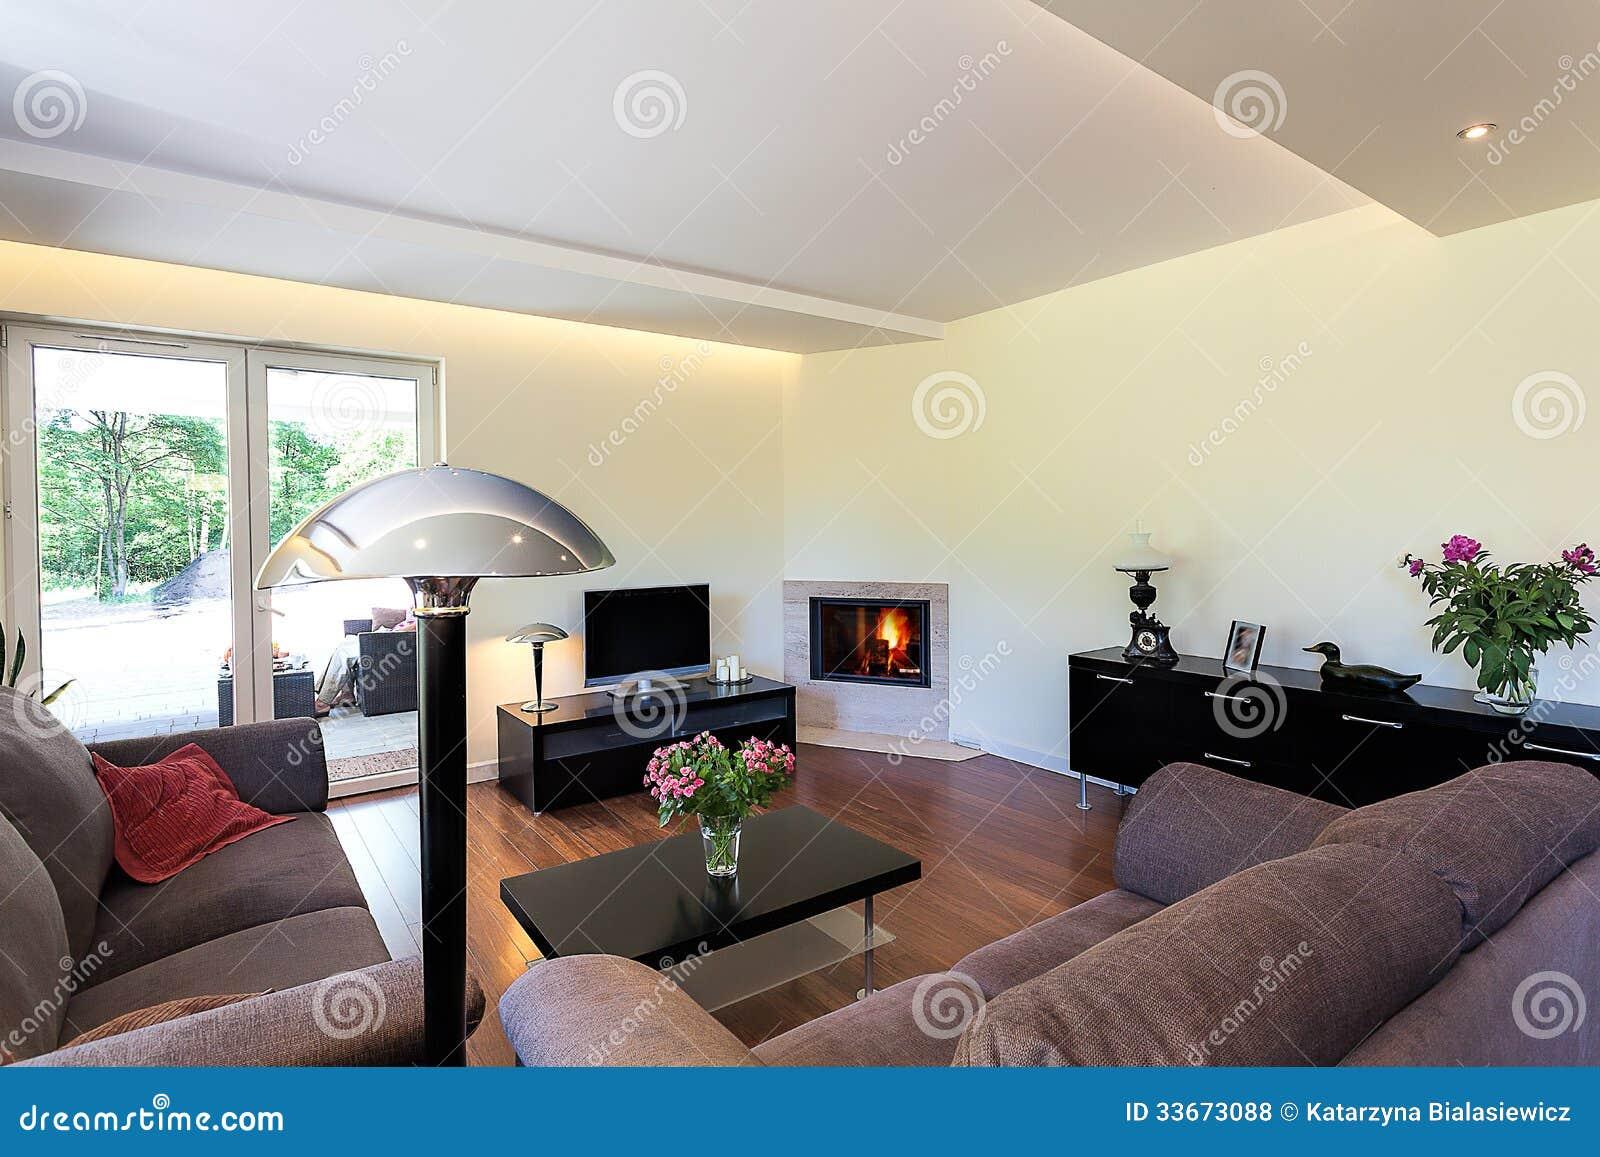 l 39 espace lumineux salon confortable photo stock image 33673088. Black Bedroom Furniture Sets. Home Design Ideas